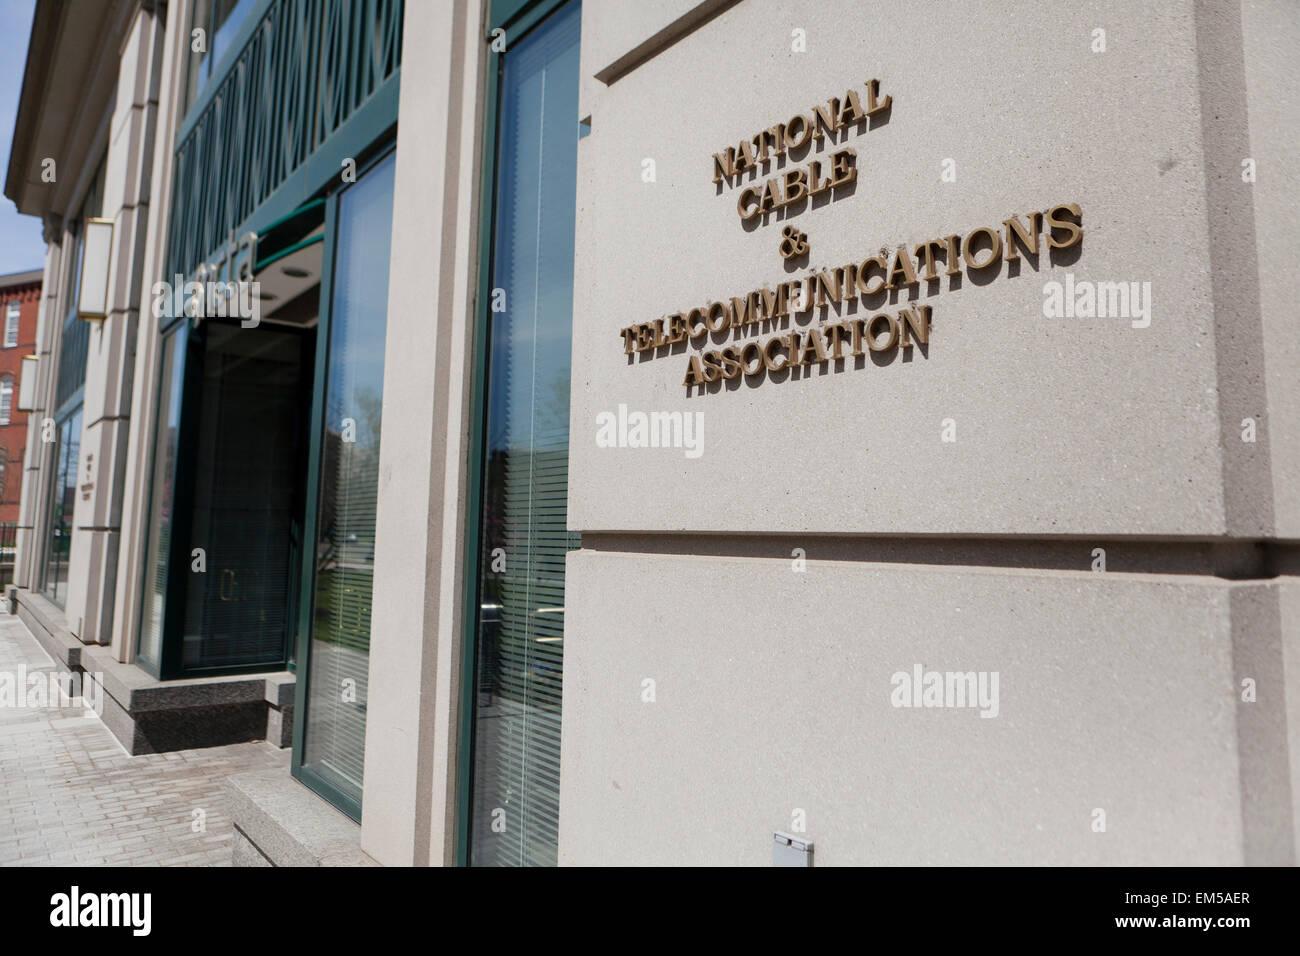 National Cable and Telecommunications Association - Washington, DC USA - Stock Image